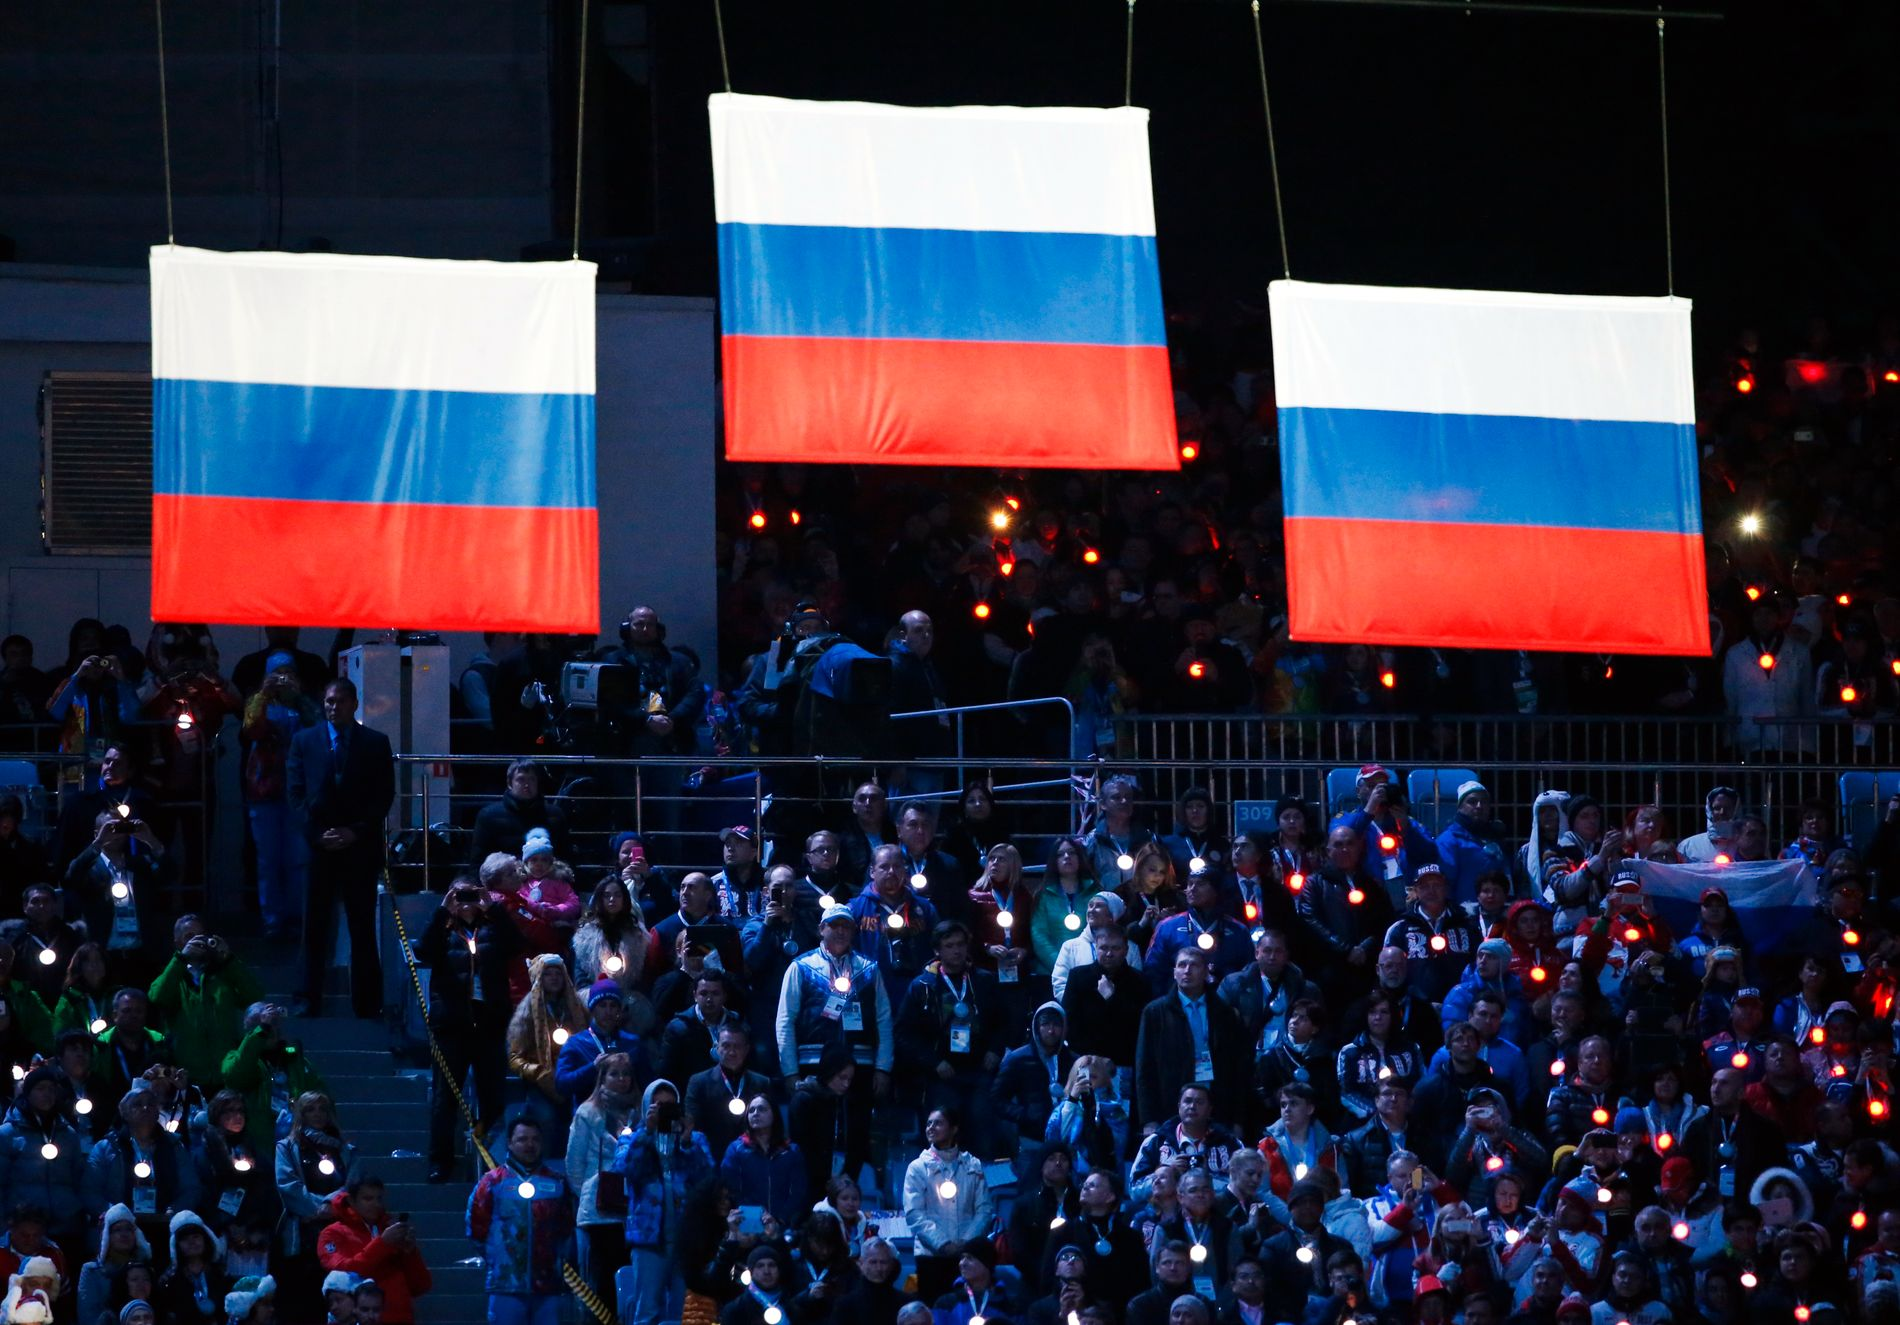 russerne i ol 51 trenere og 10 medisinere utestengt